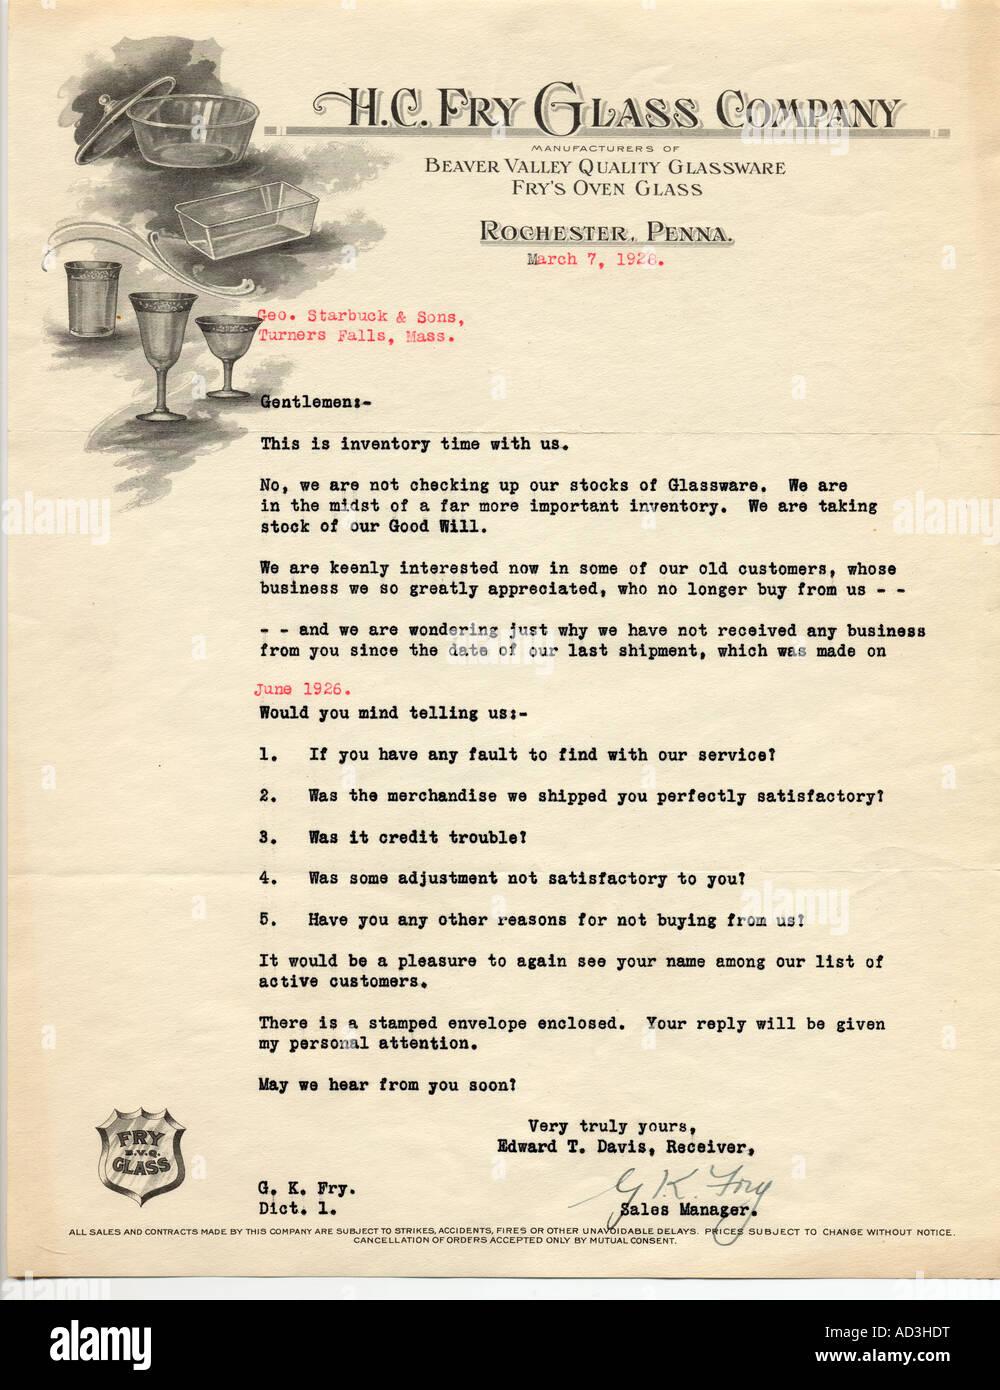 1928 hc fry glass company customer retention letter stock photo 1928 hc fry glass company customer retention letter spiritdancerdesigns Gallery